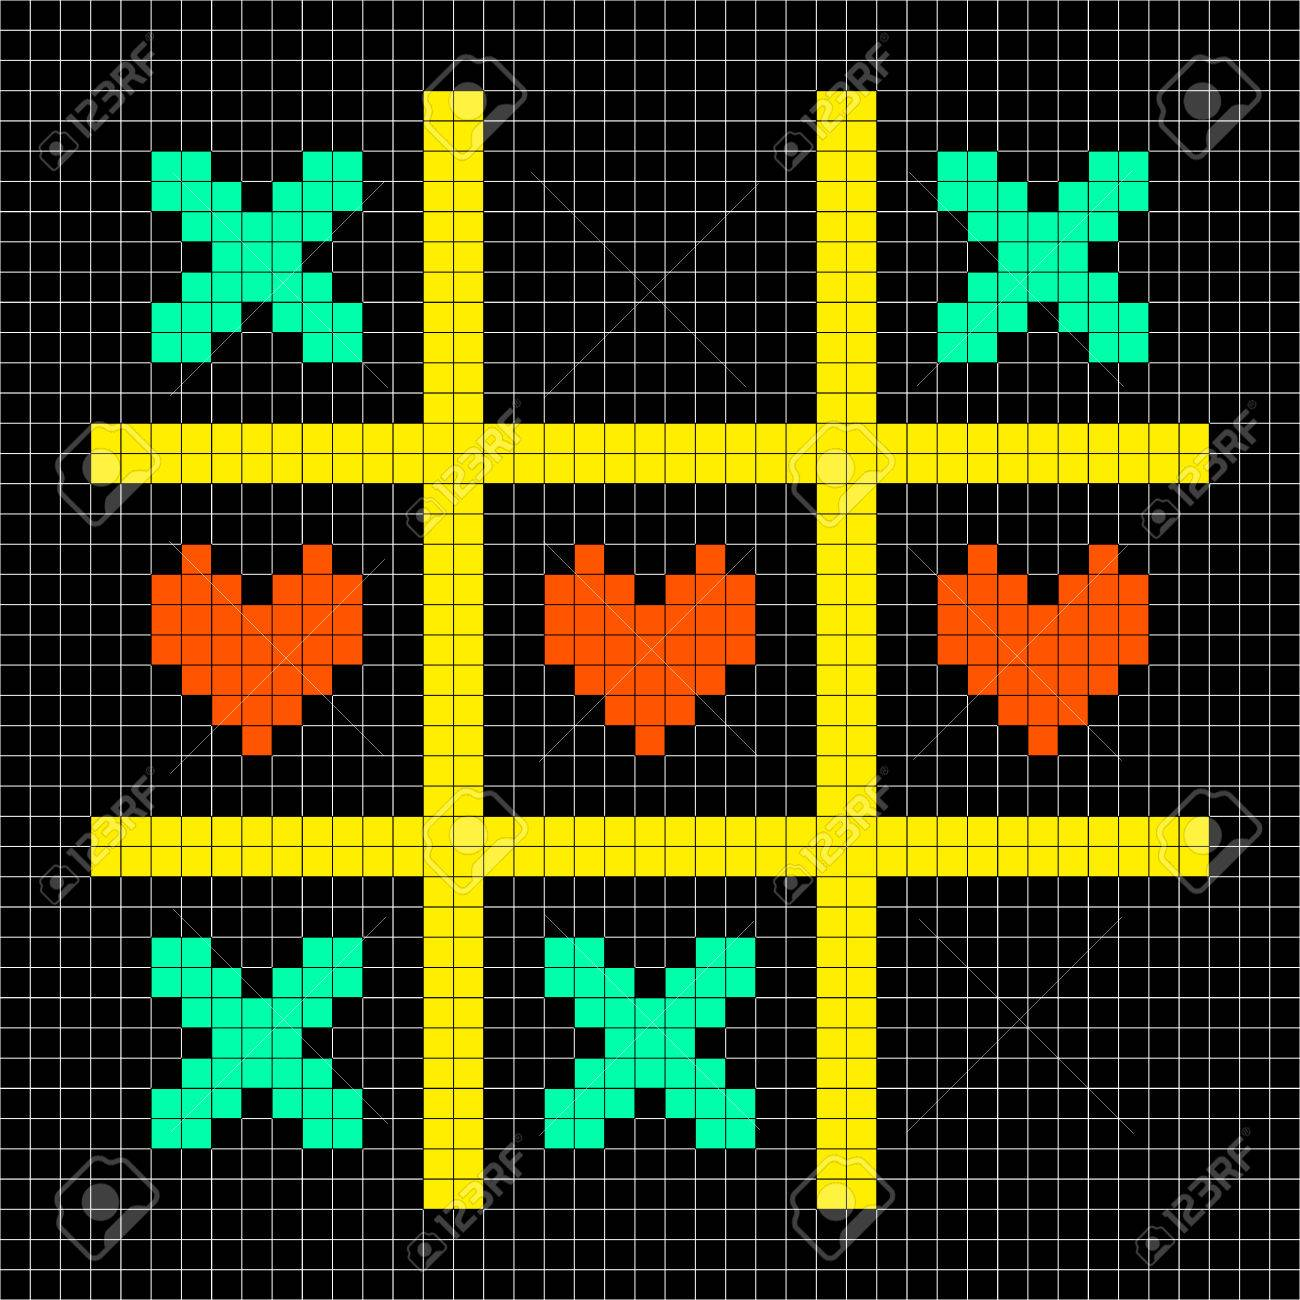 8-bit Pixel Art Tic Tac Toe Game With Kisses and Love Heart Symbols Stock Vector - 23292134